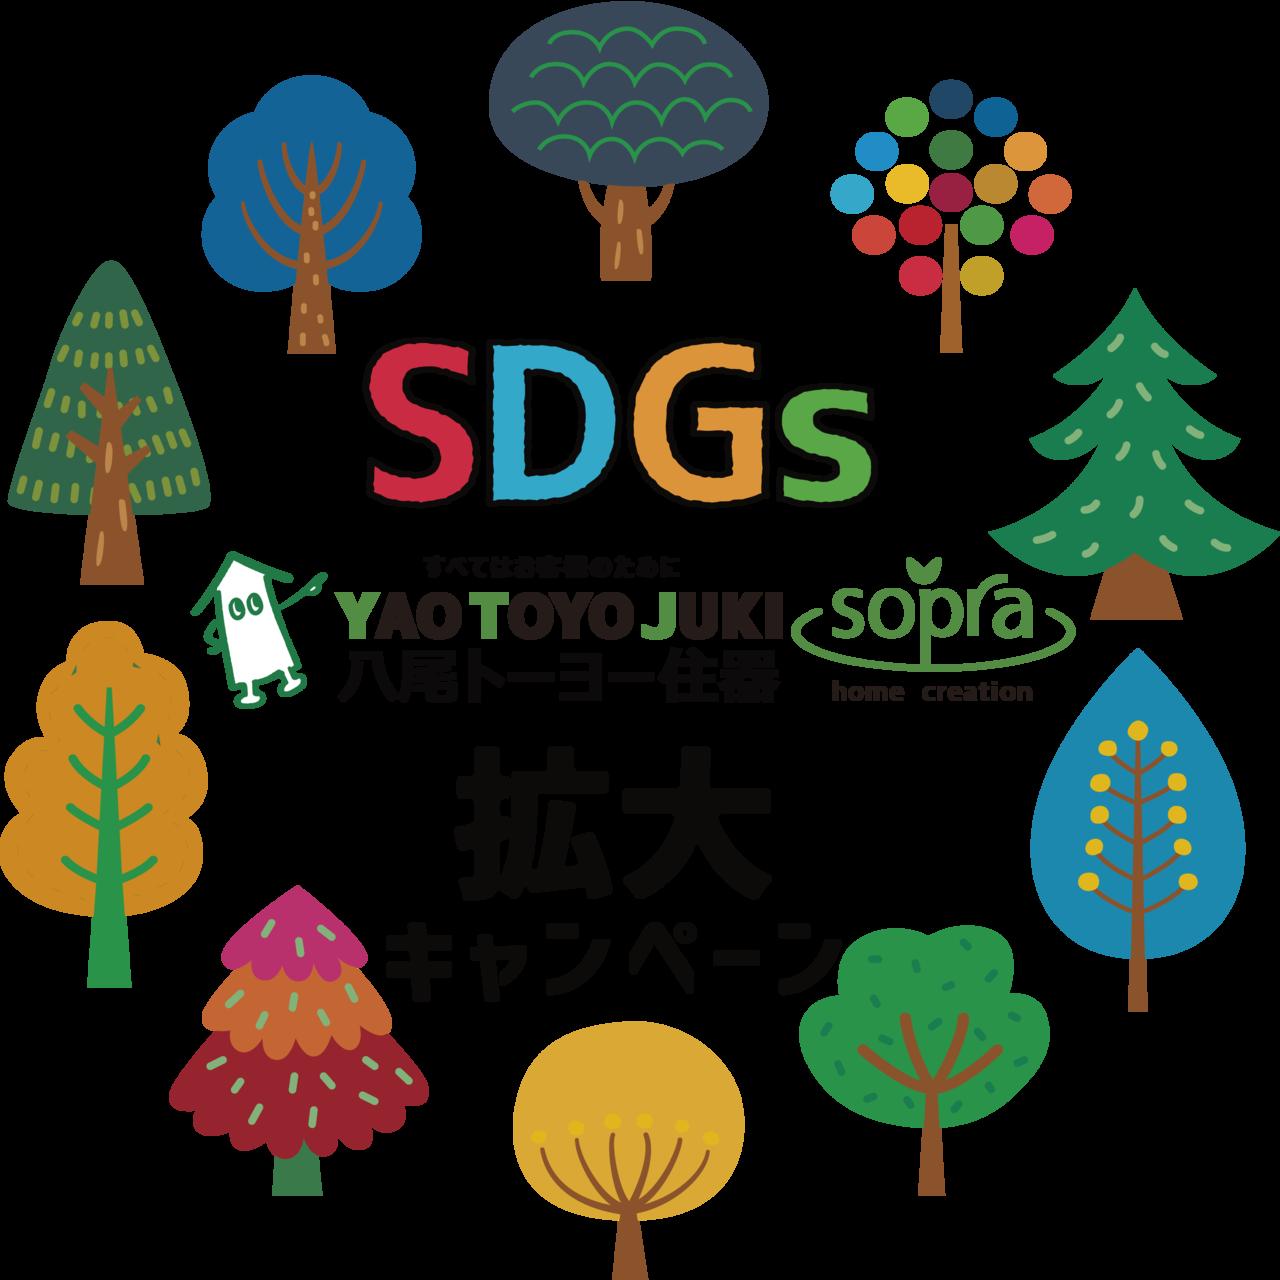 SDGs拡大キャンペーン